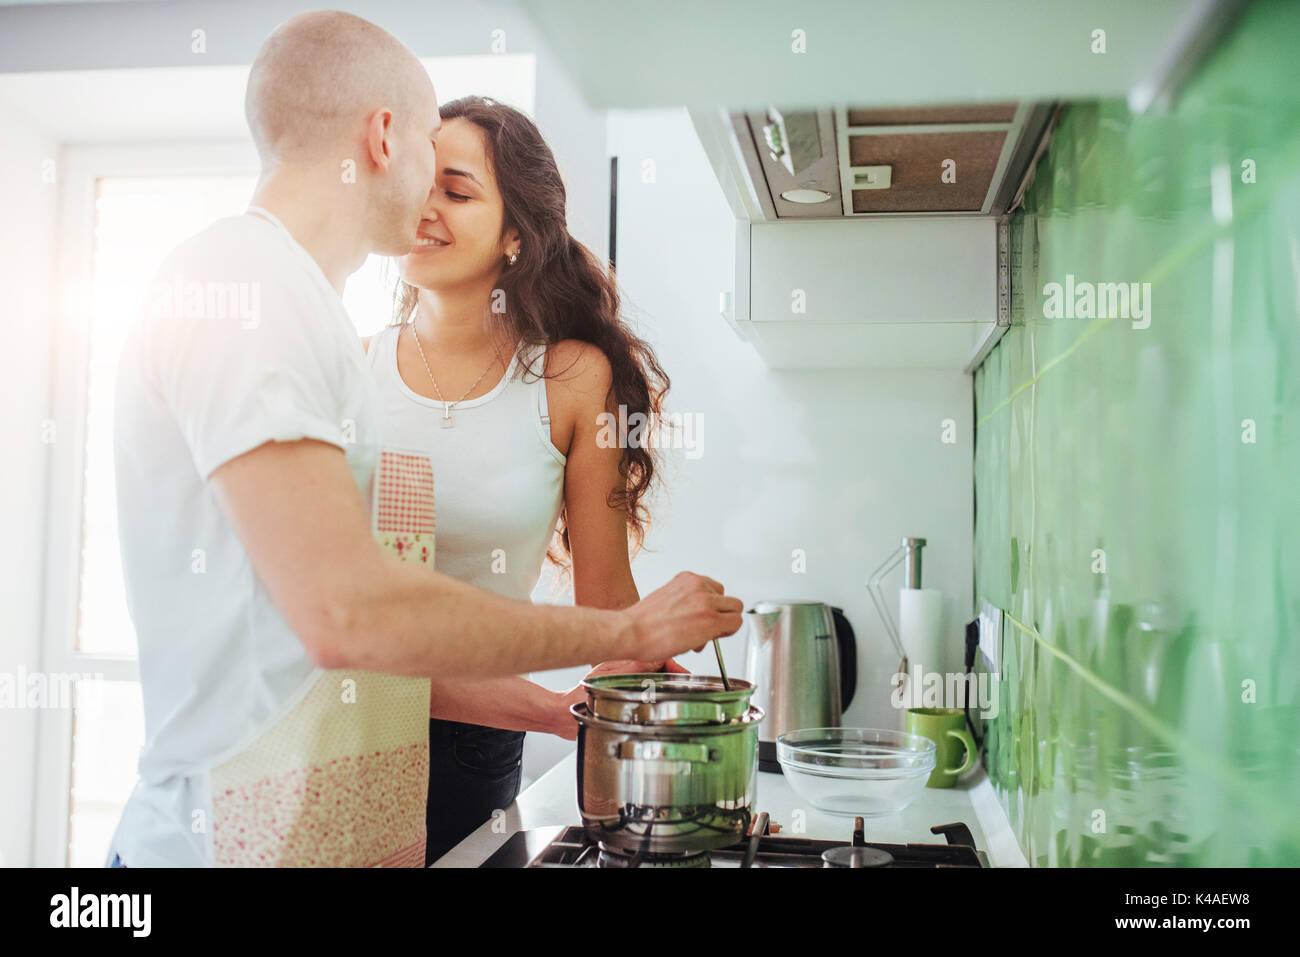 Joven pareja feliz preparando sobre la estufa Imagen De Stock